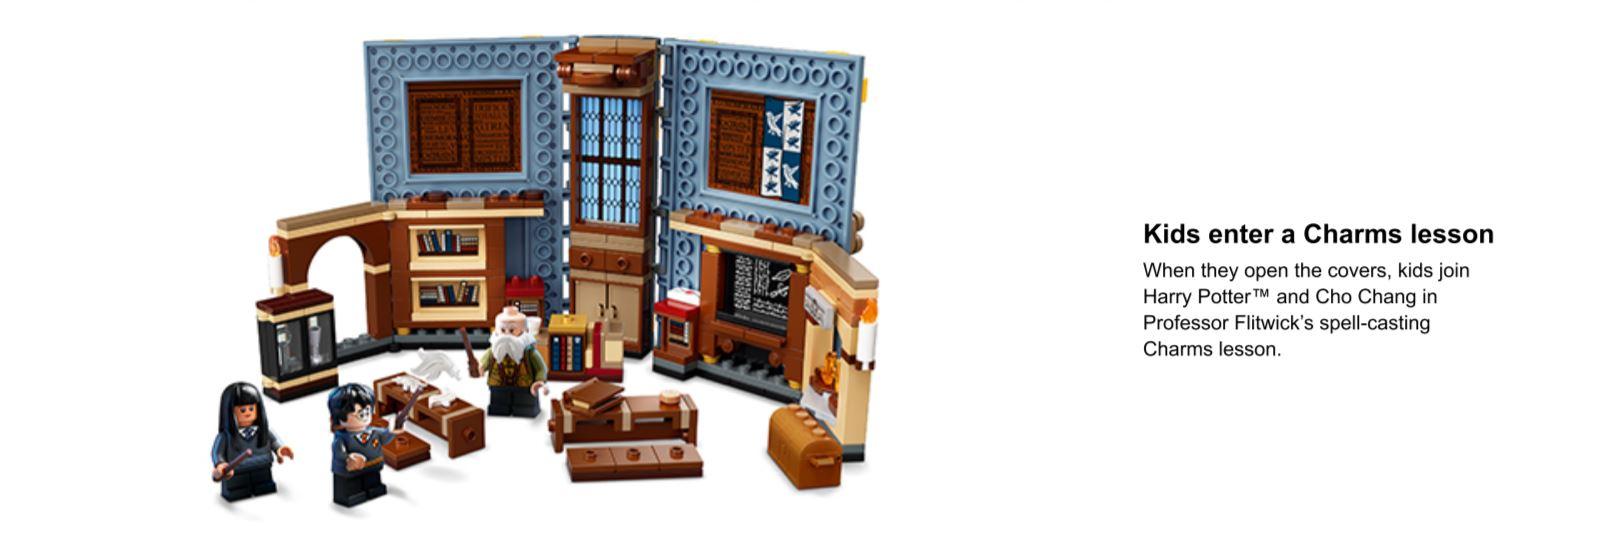 harry potter lego set shot